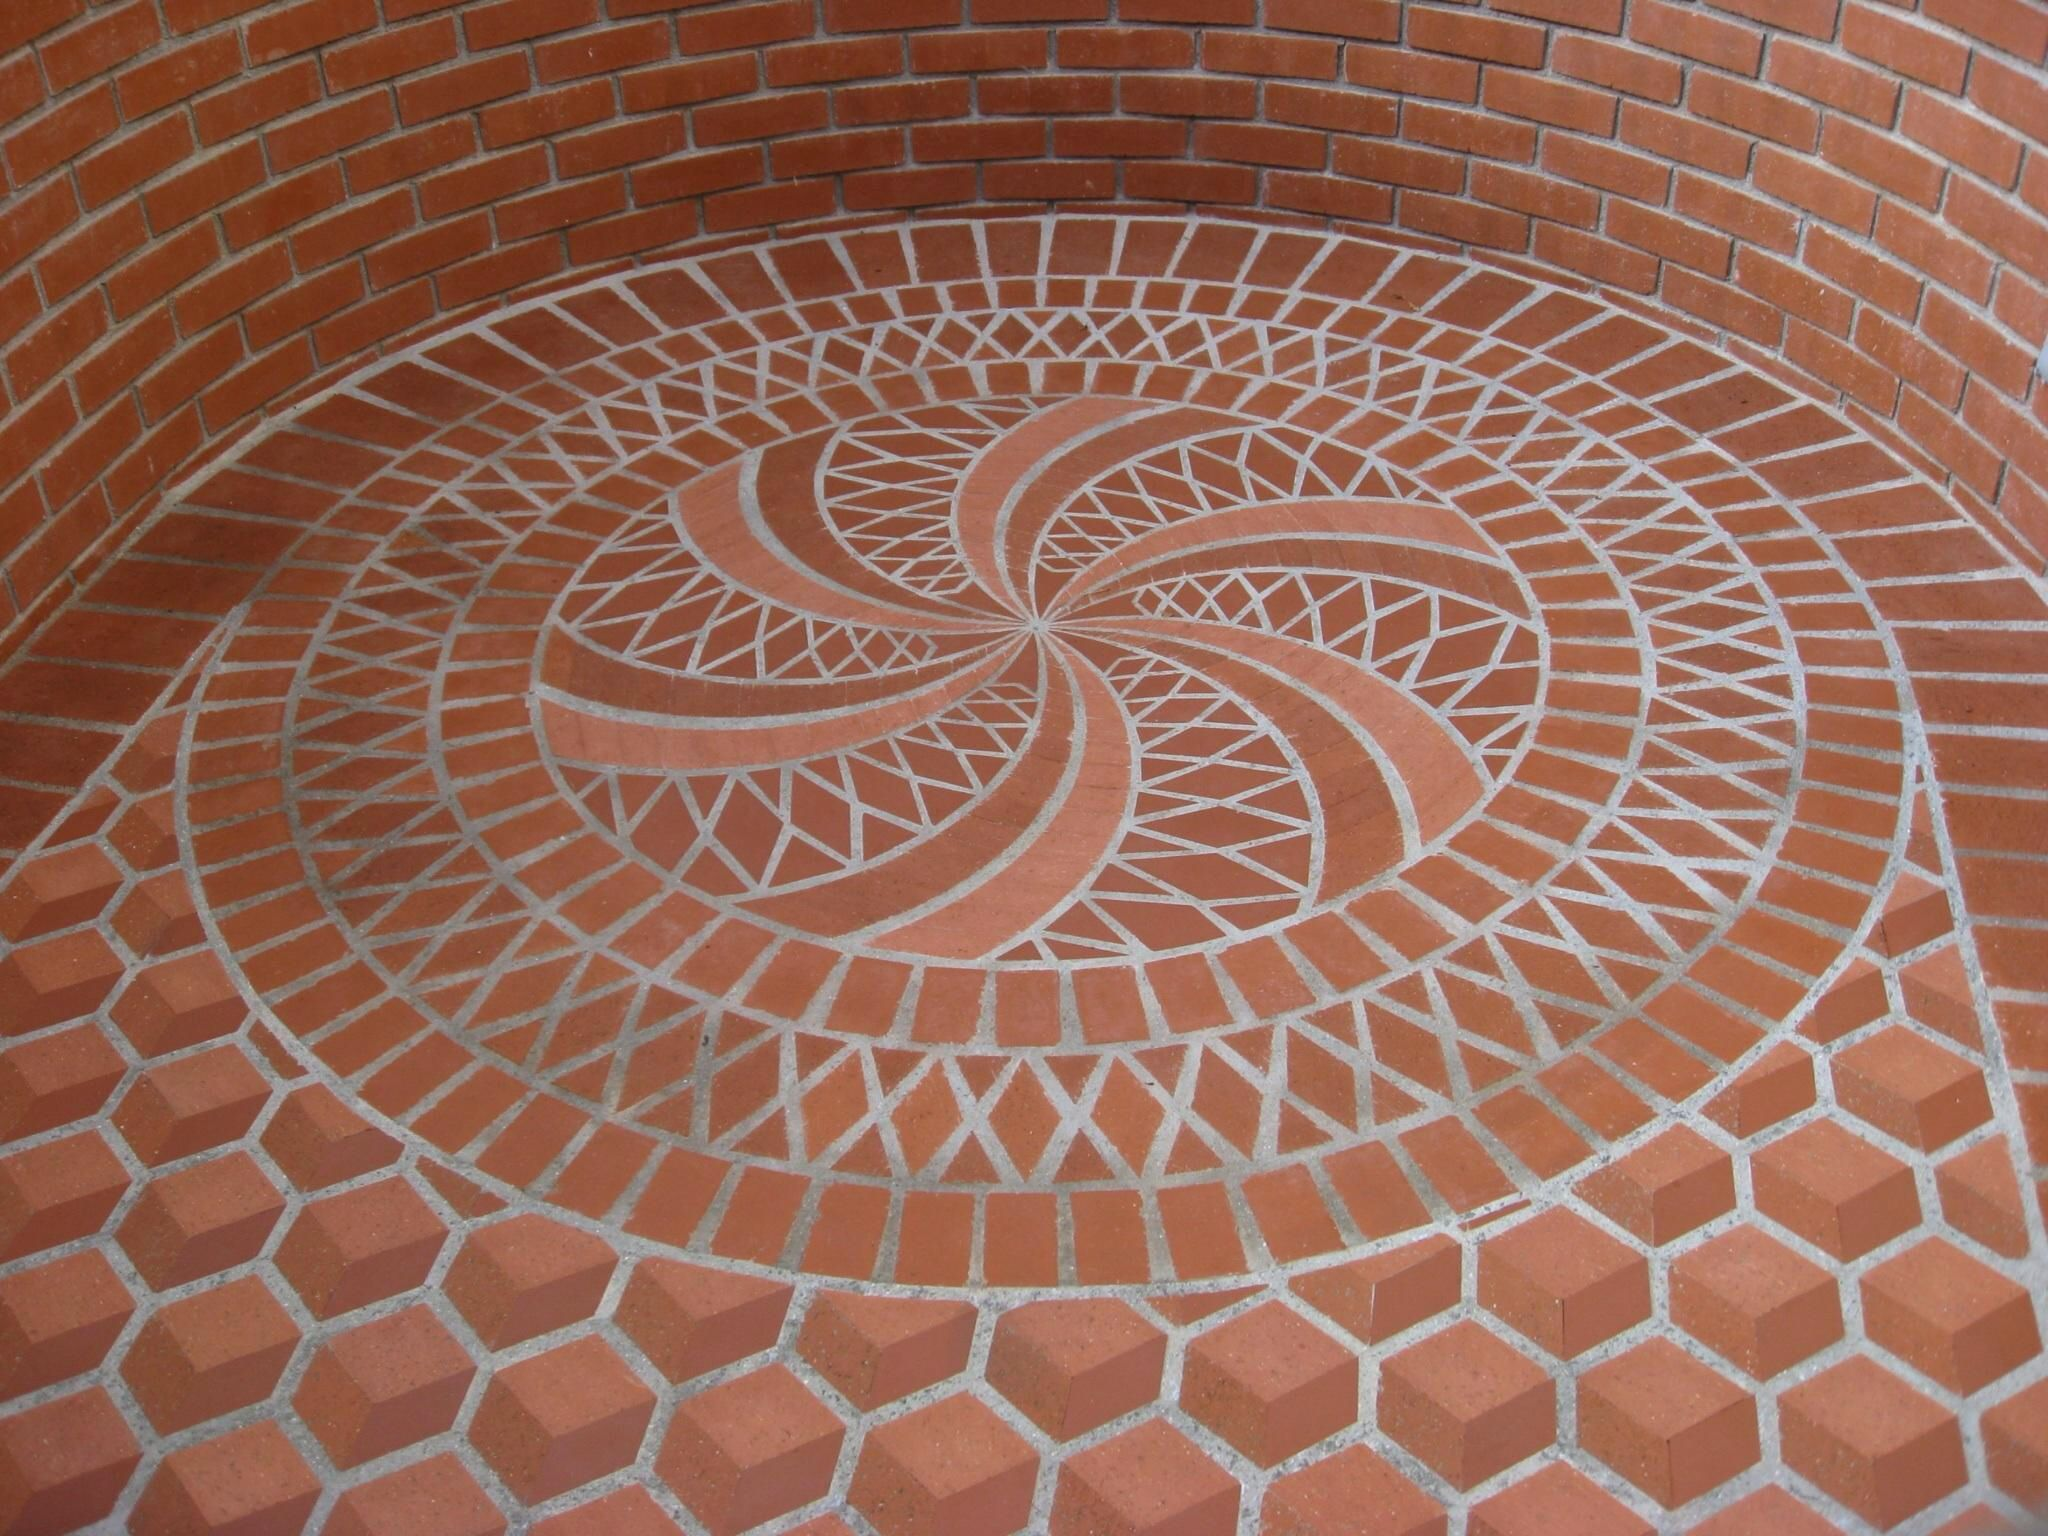 Cool Brick Pattern By Paul Barnes